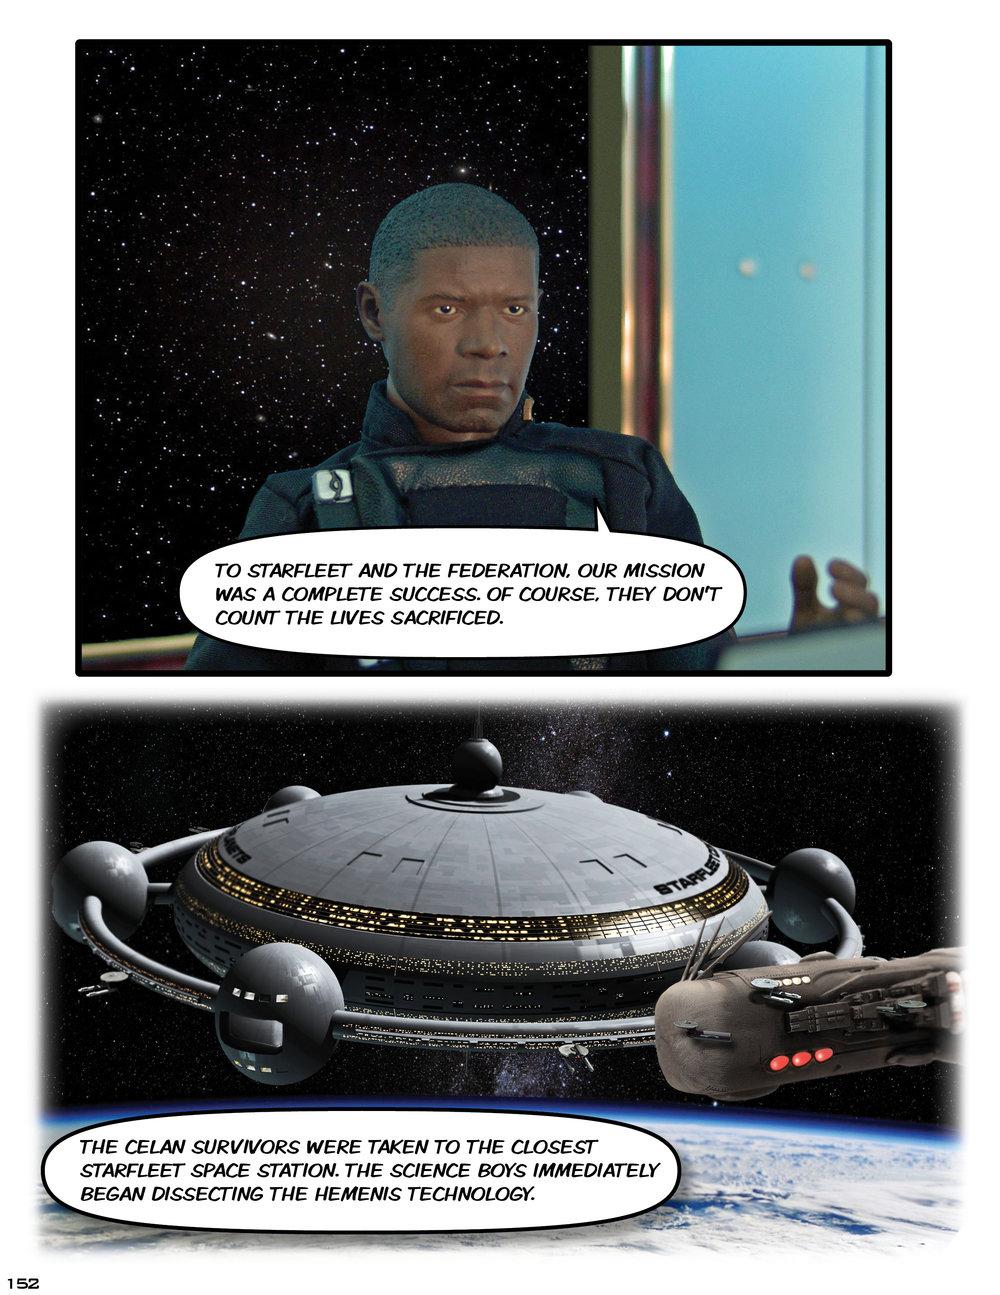 Star Trek_ Battle Logs Pages152.jpg